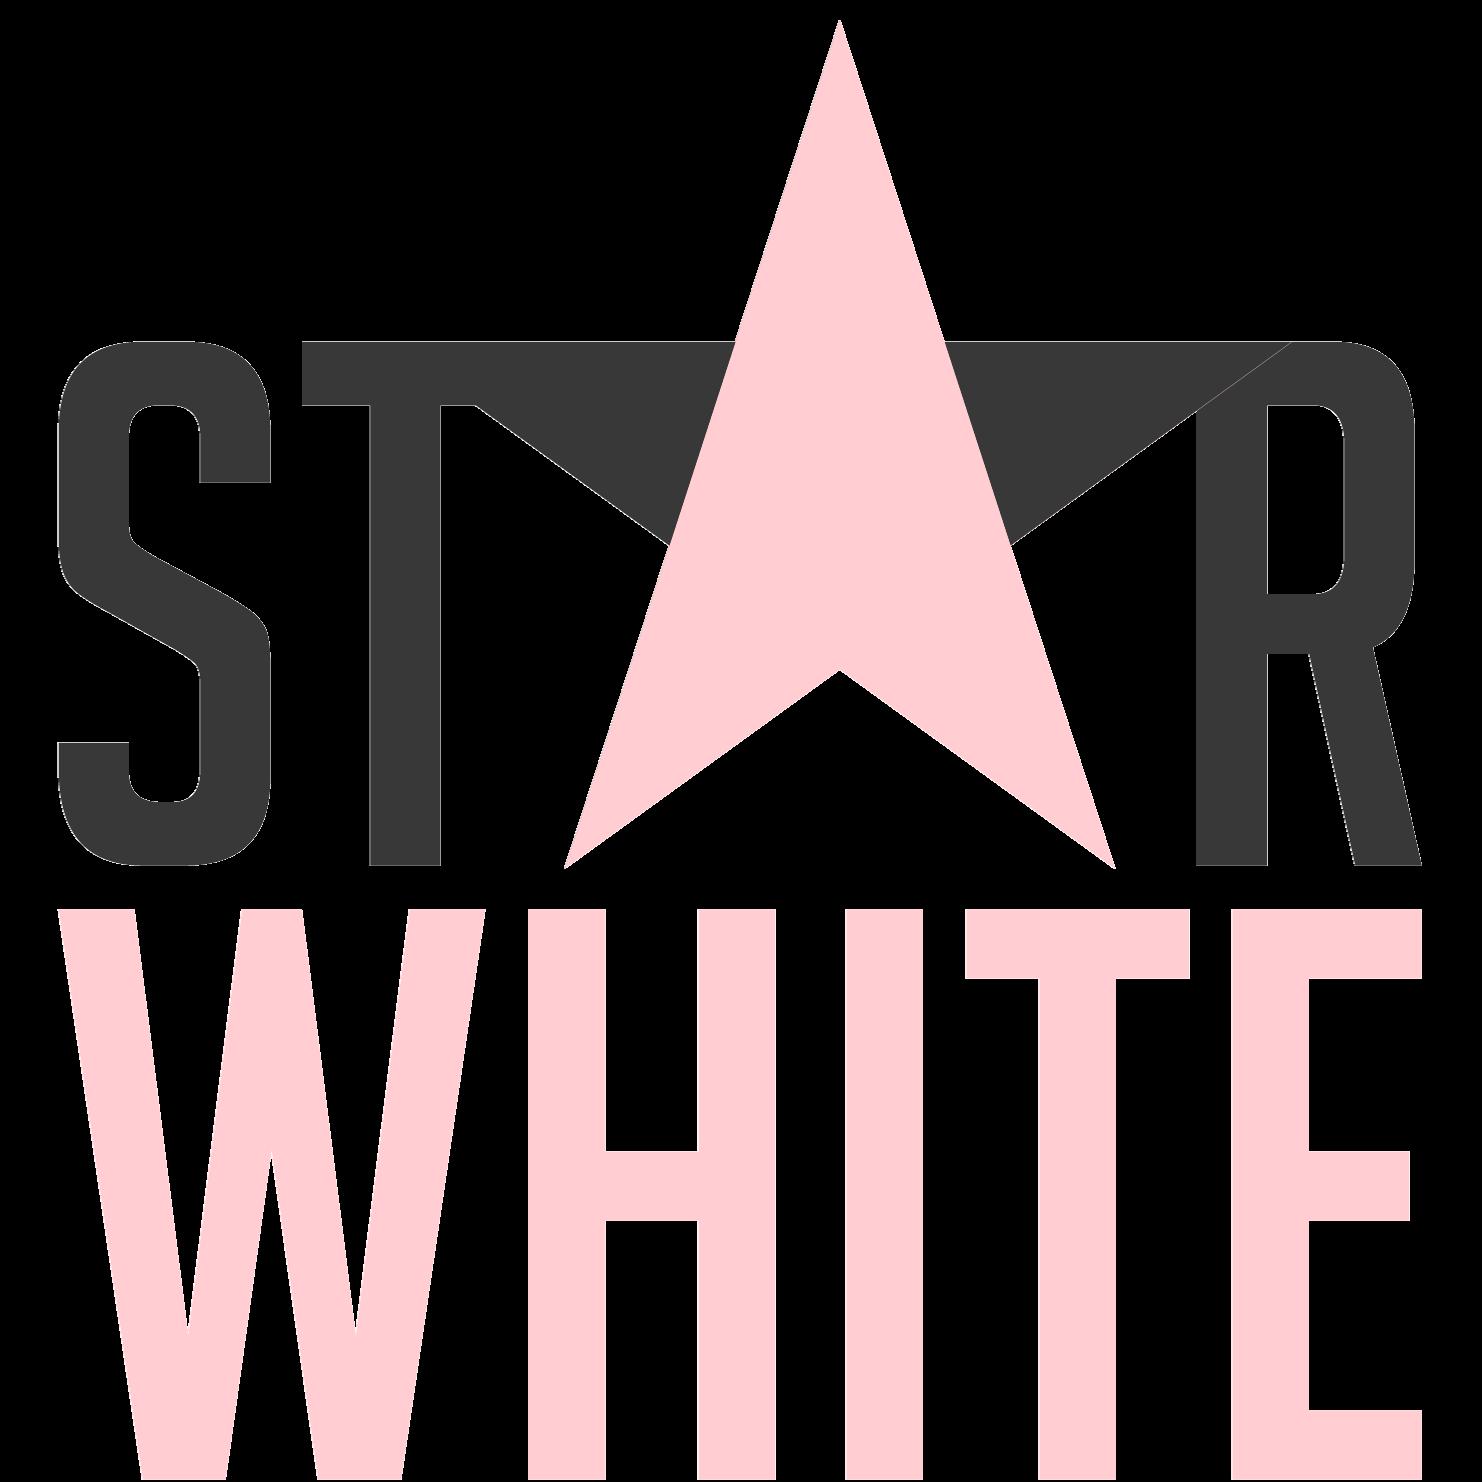 Star White Teeth Logo